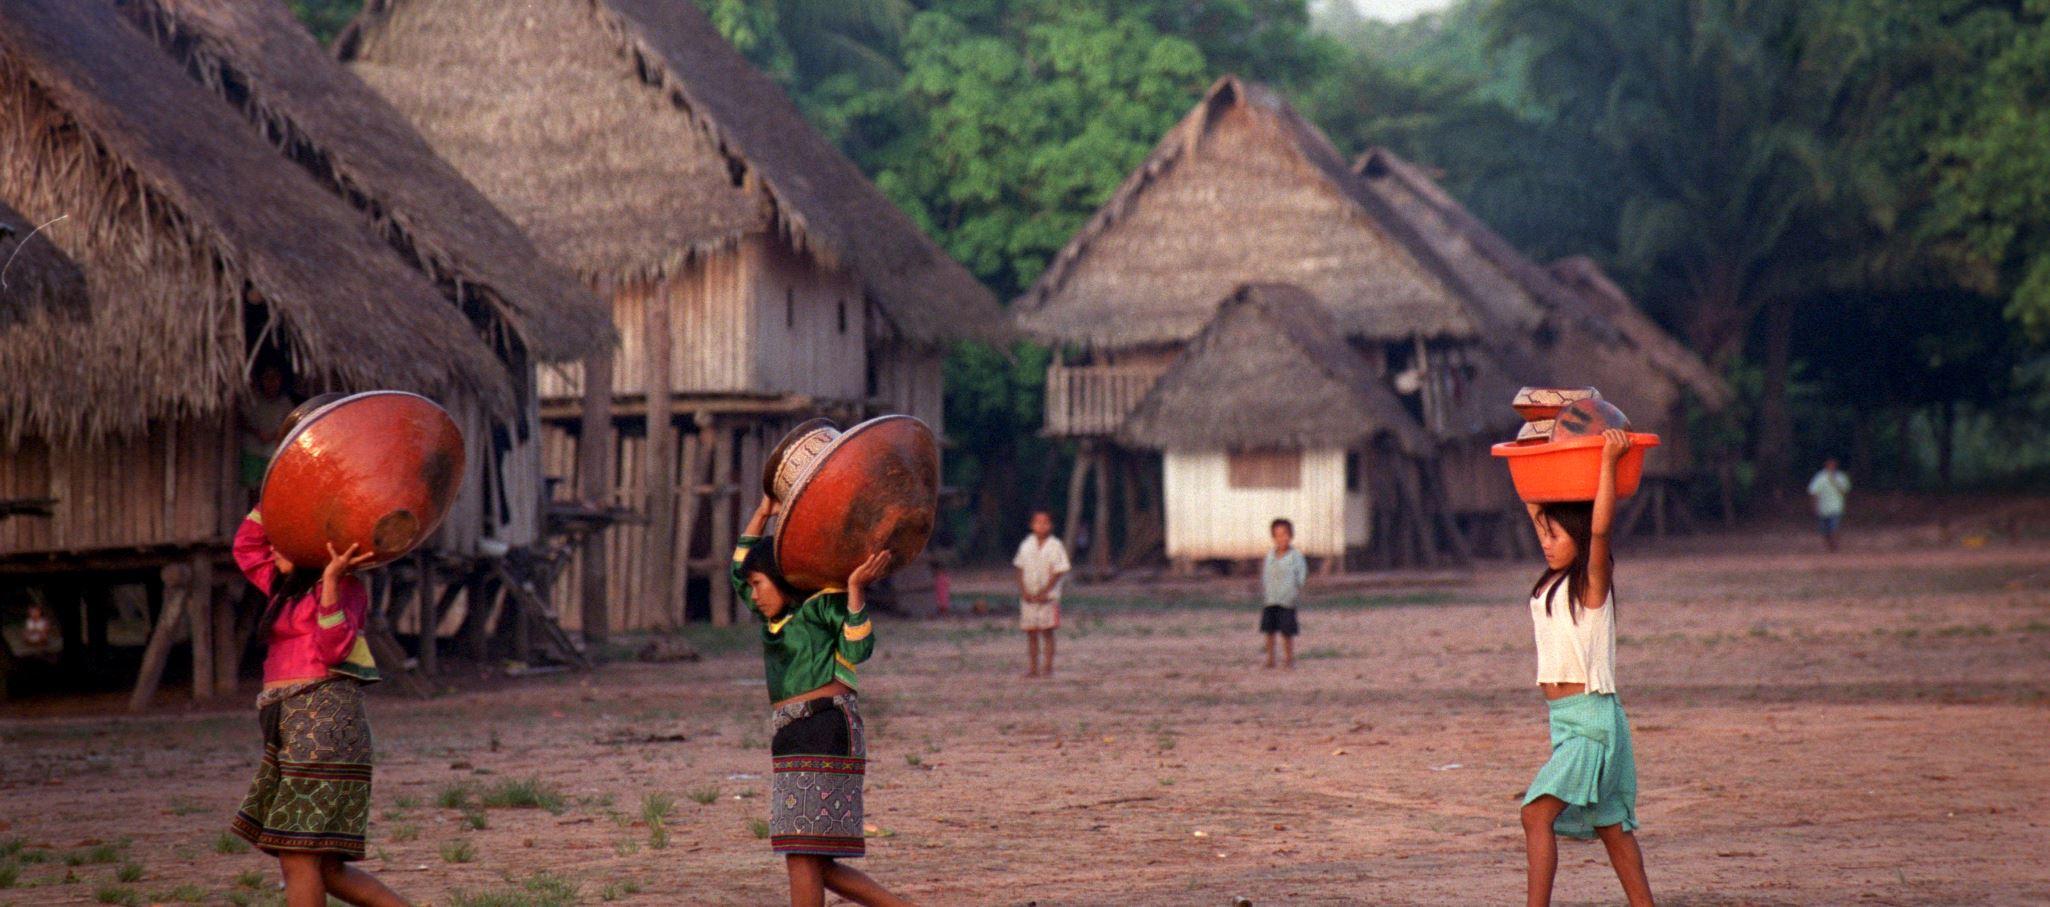 Cordillera Village